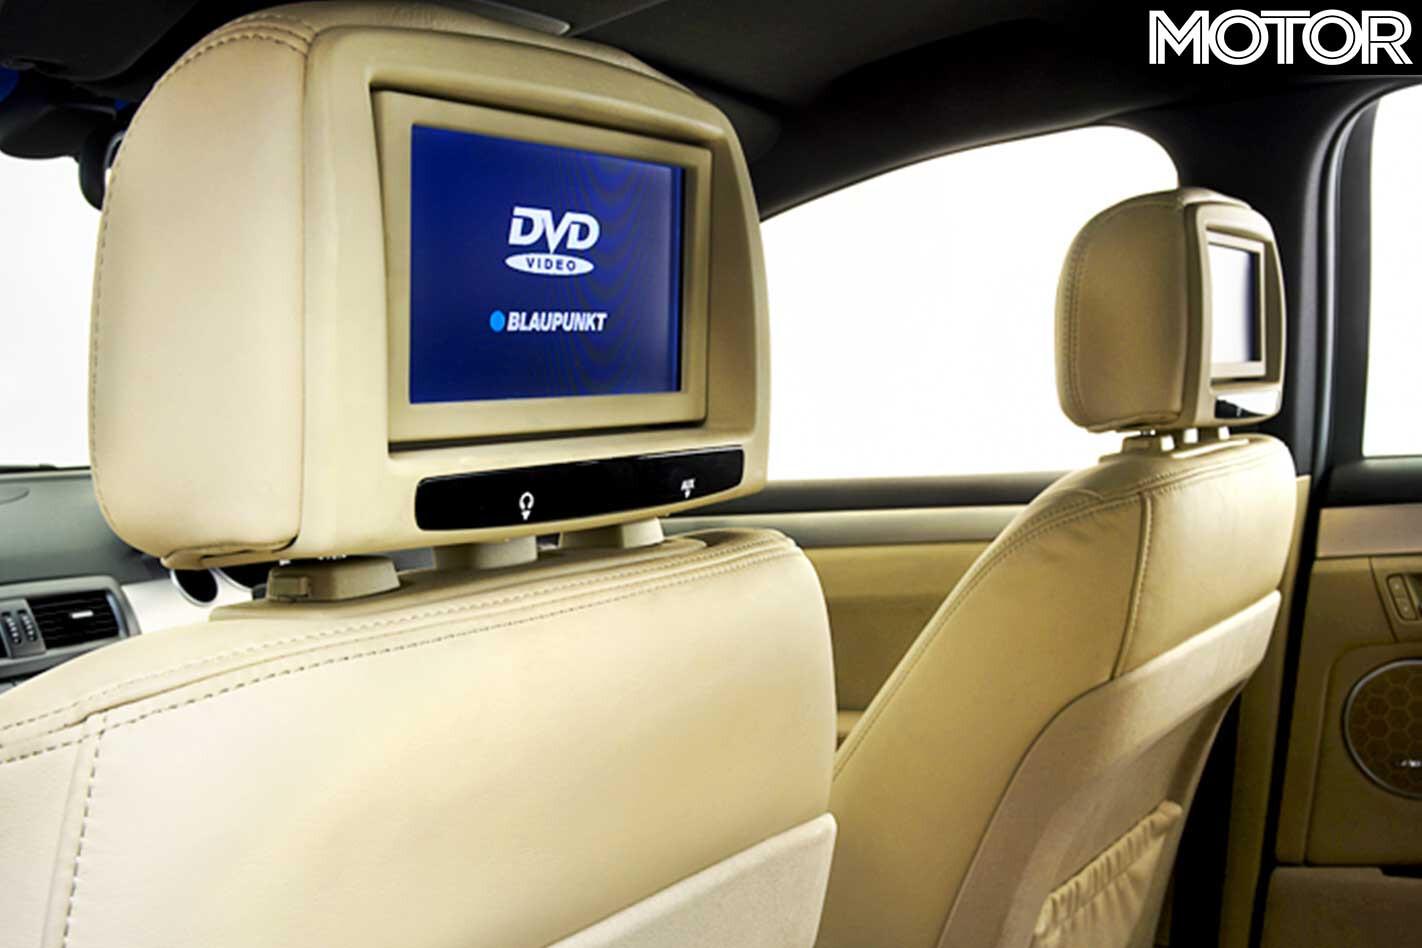 2006 Holden WM Caprice Rear Seat Entertainment Jpg